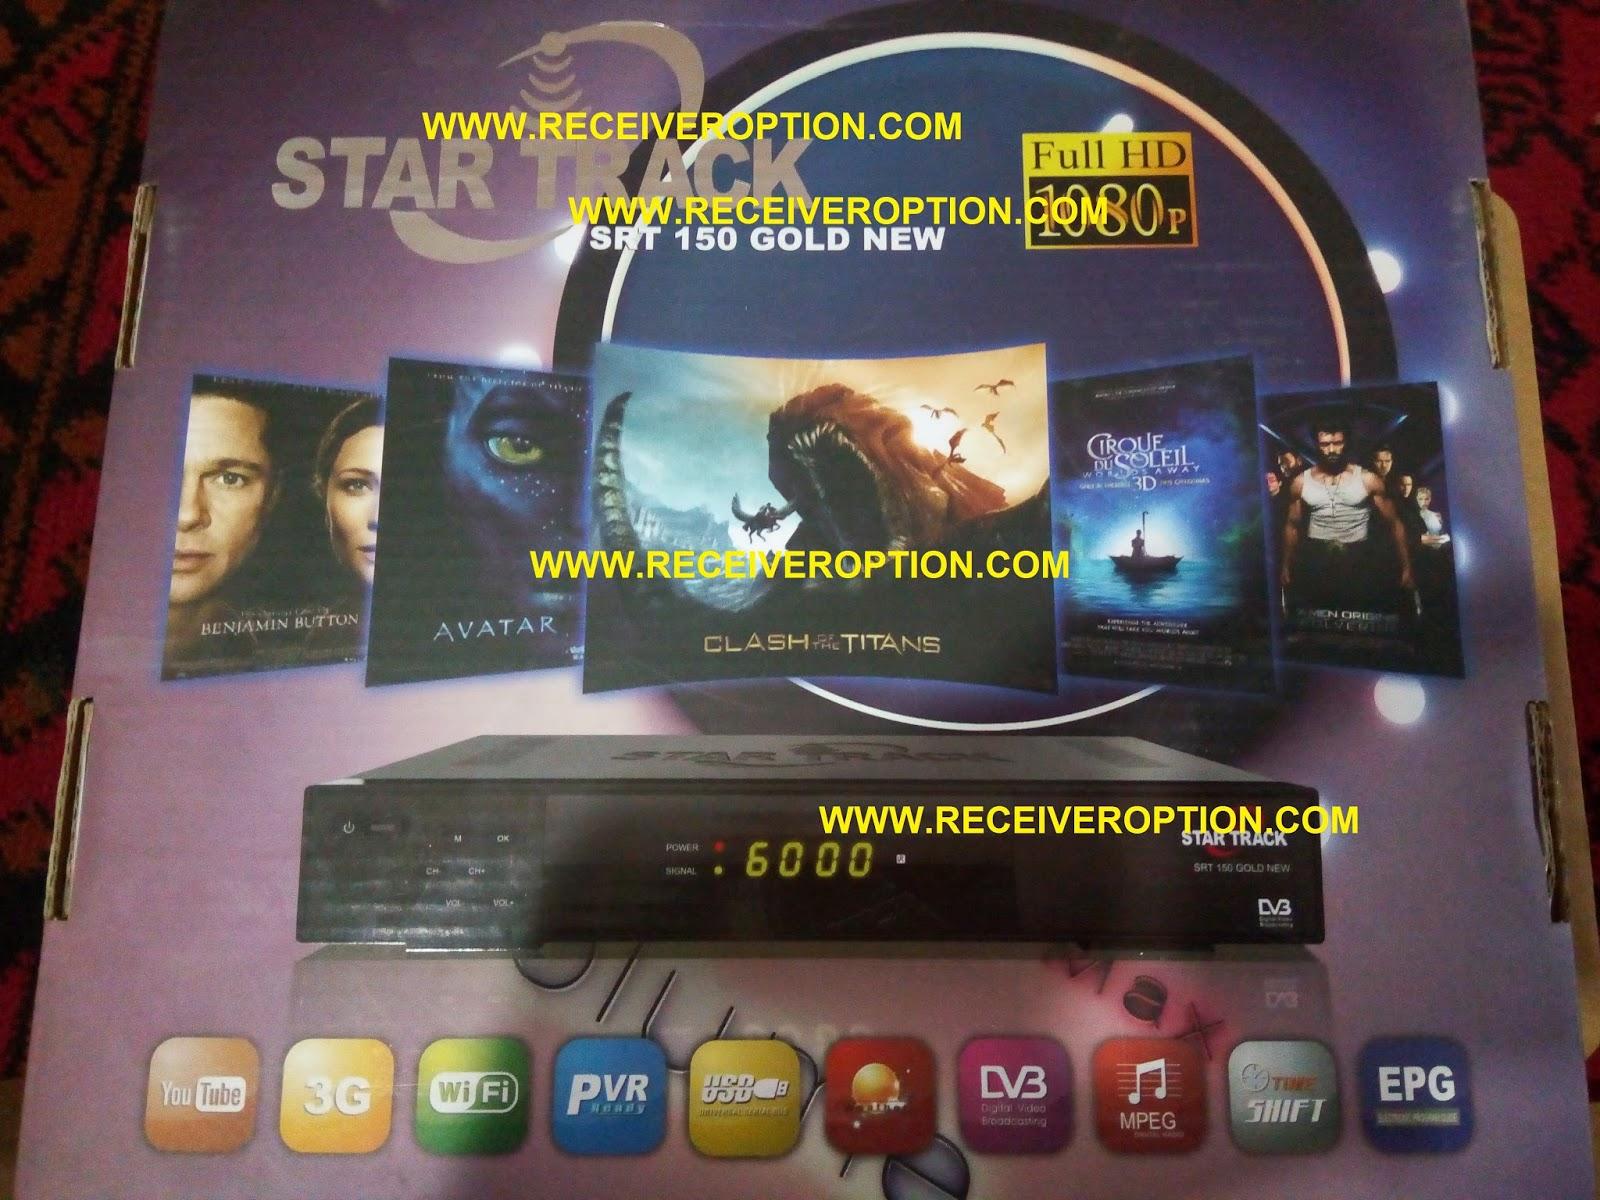 HD Receivers StarSat 9751275 - bunkyo info